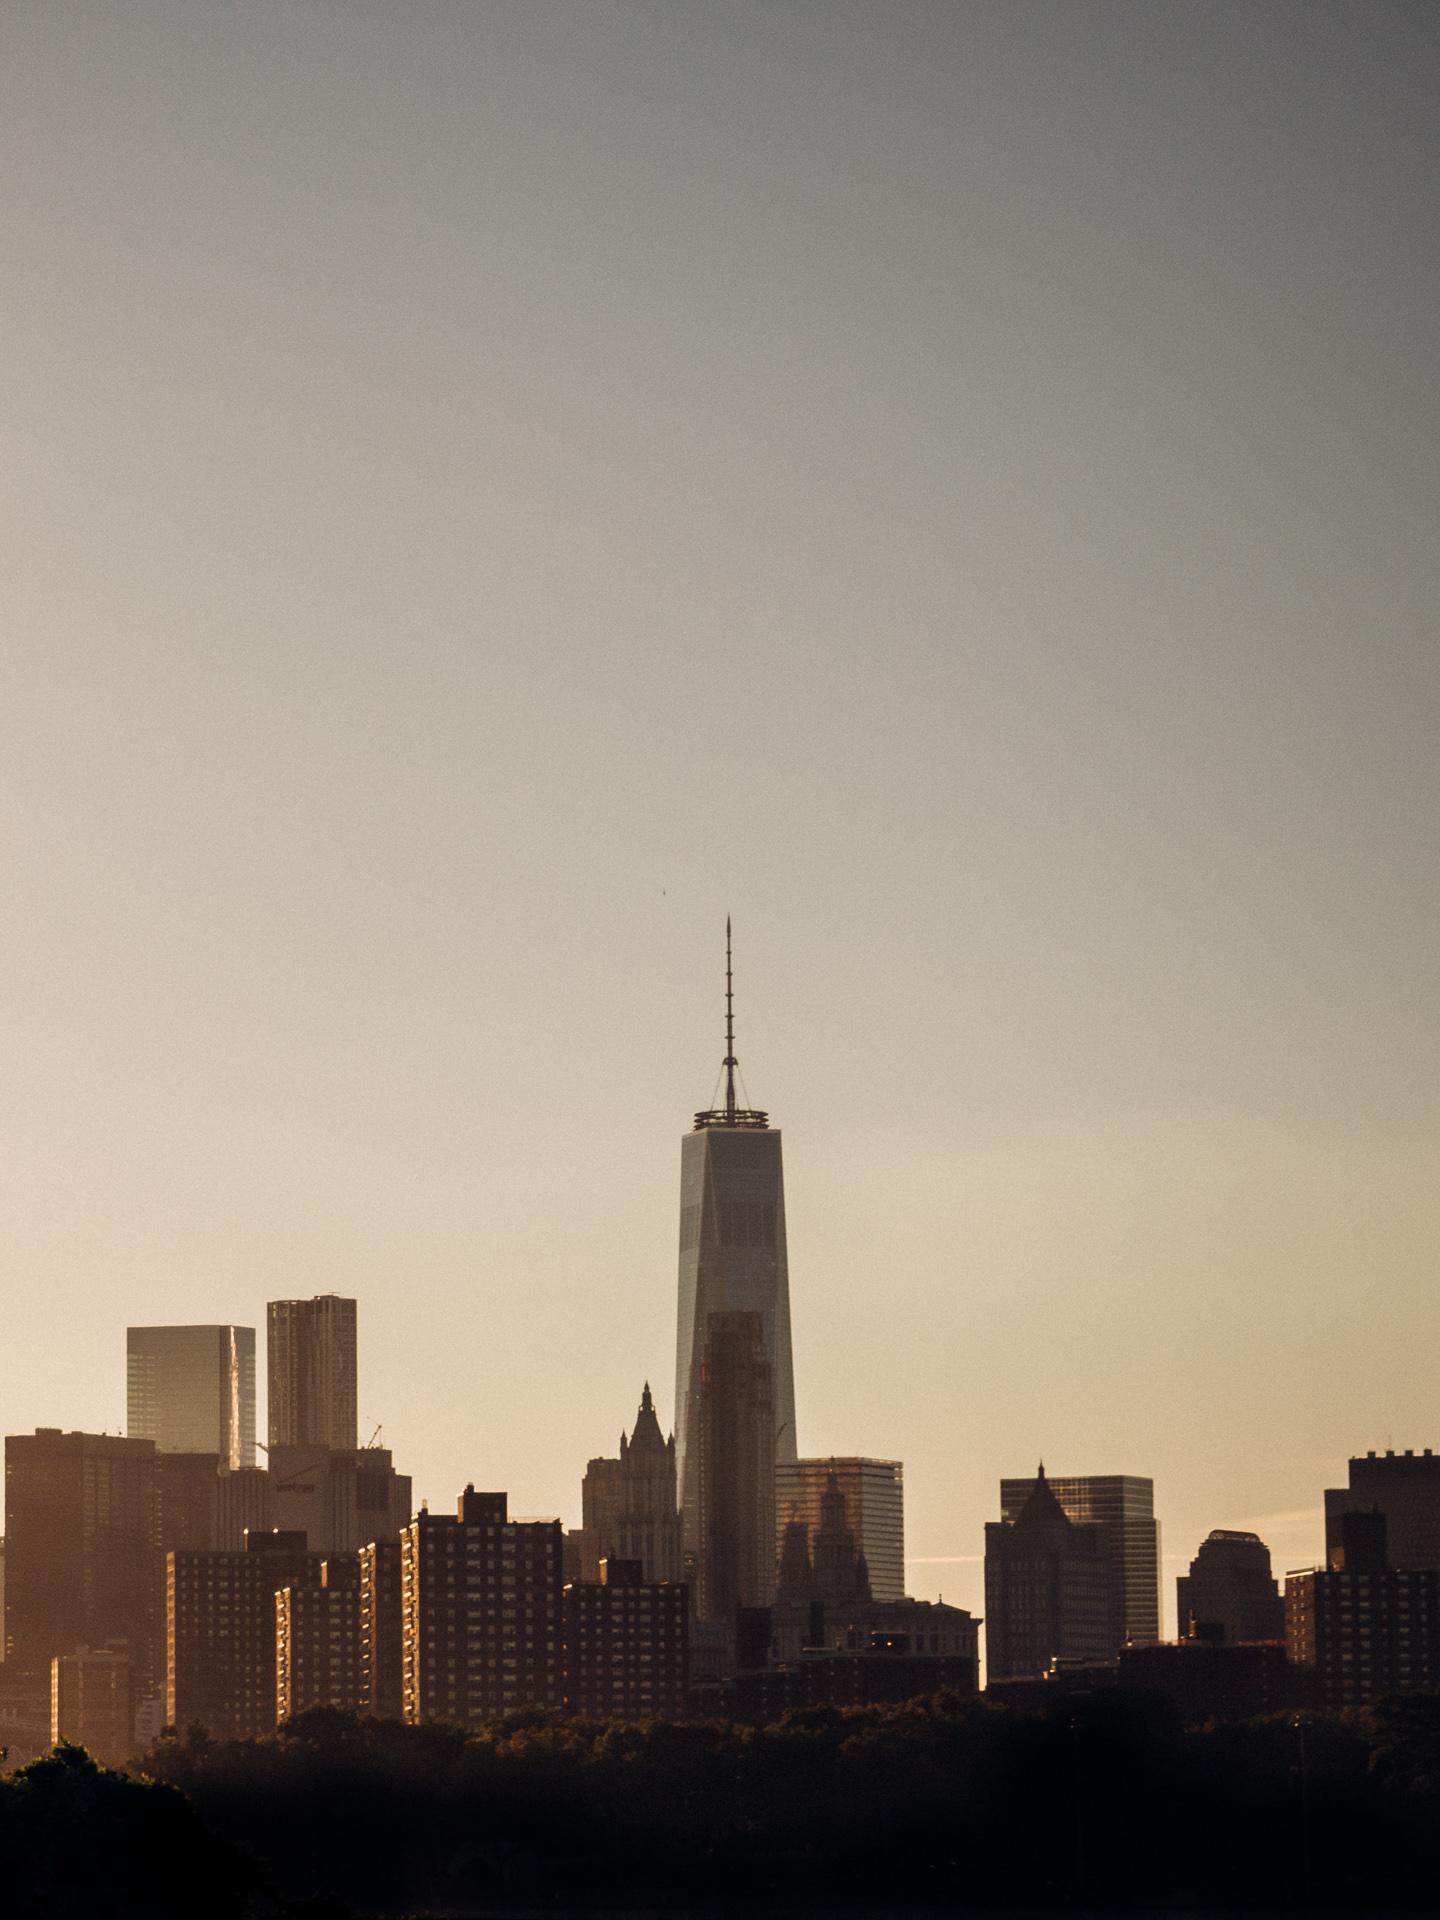 World Trade Center One im Sonnenuntergang